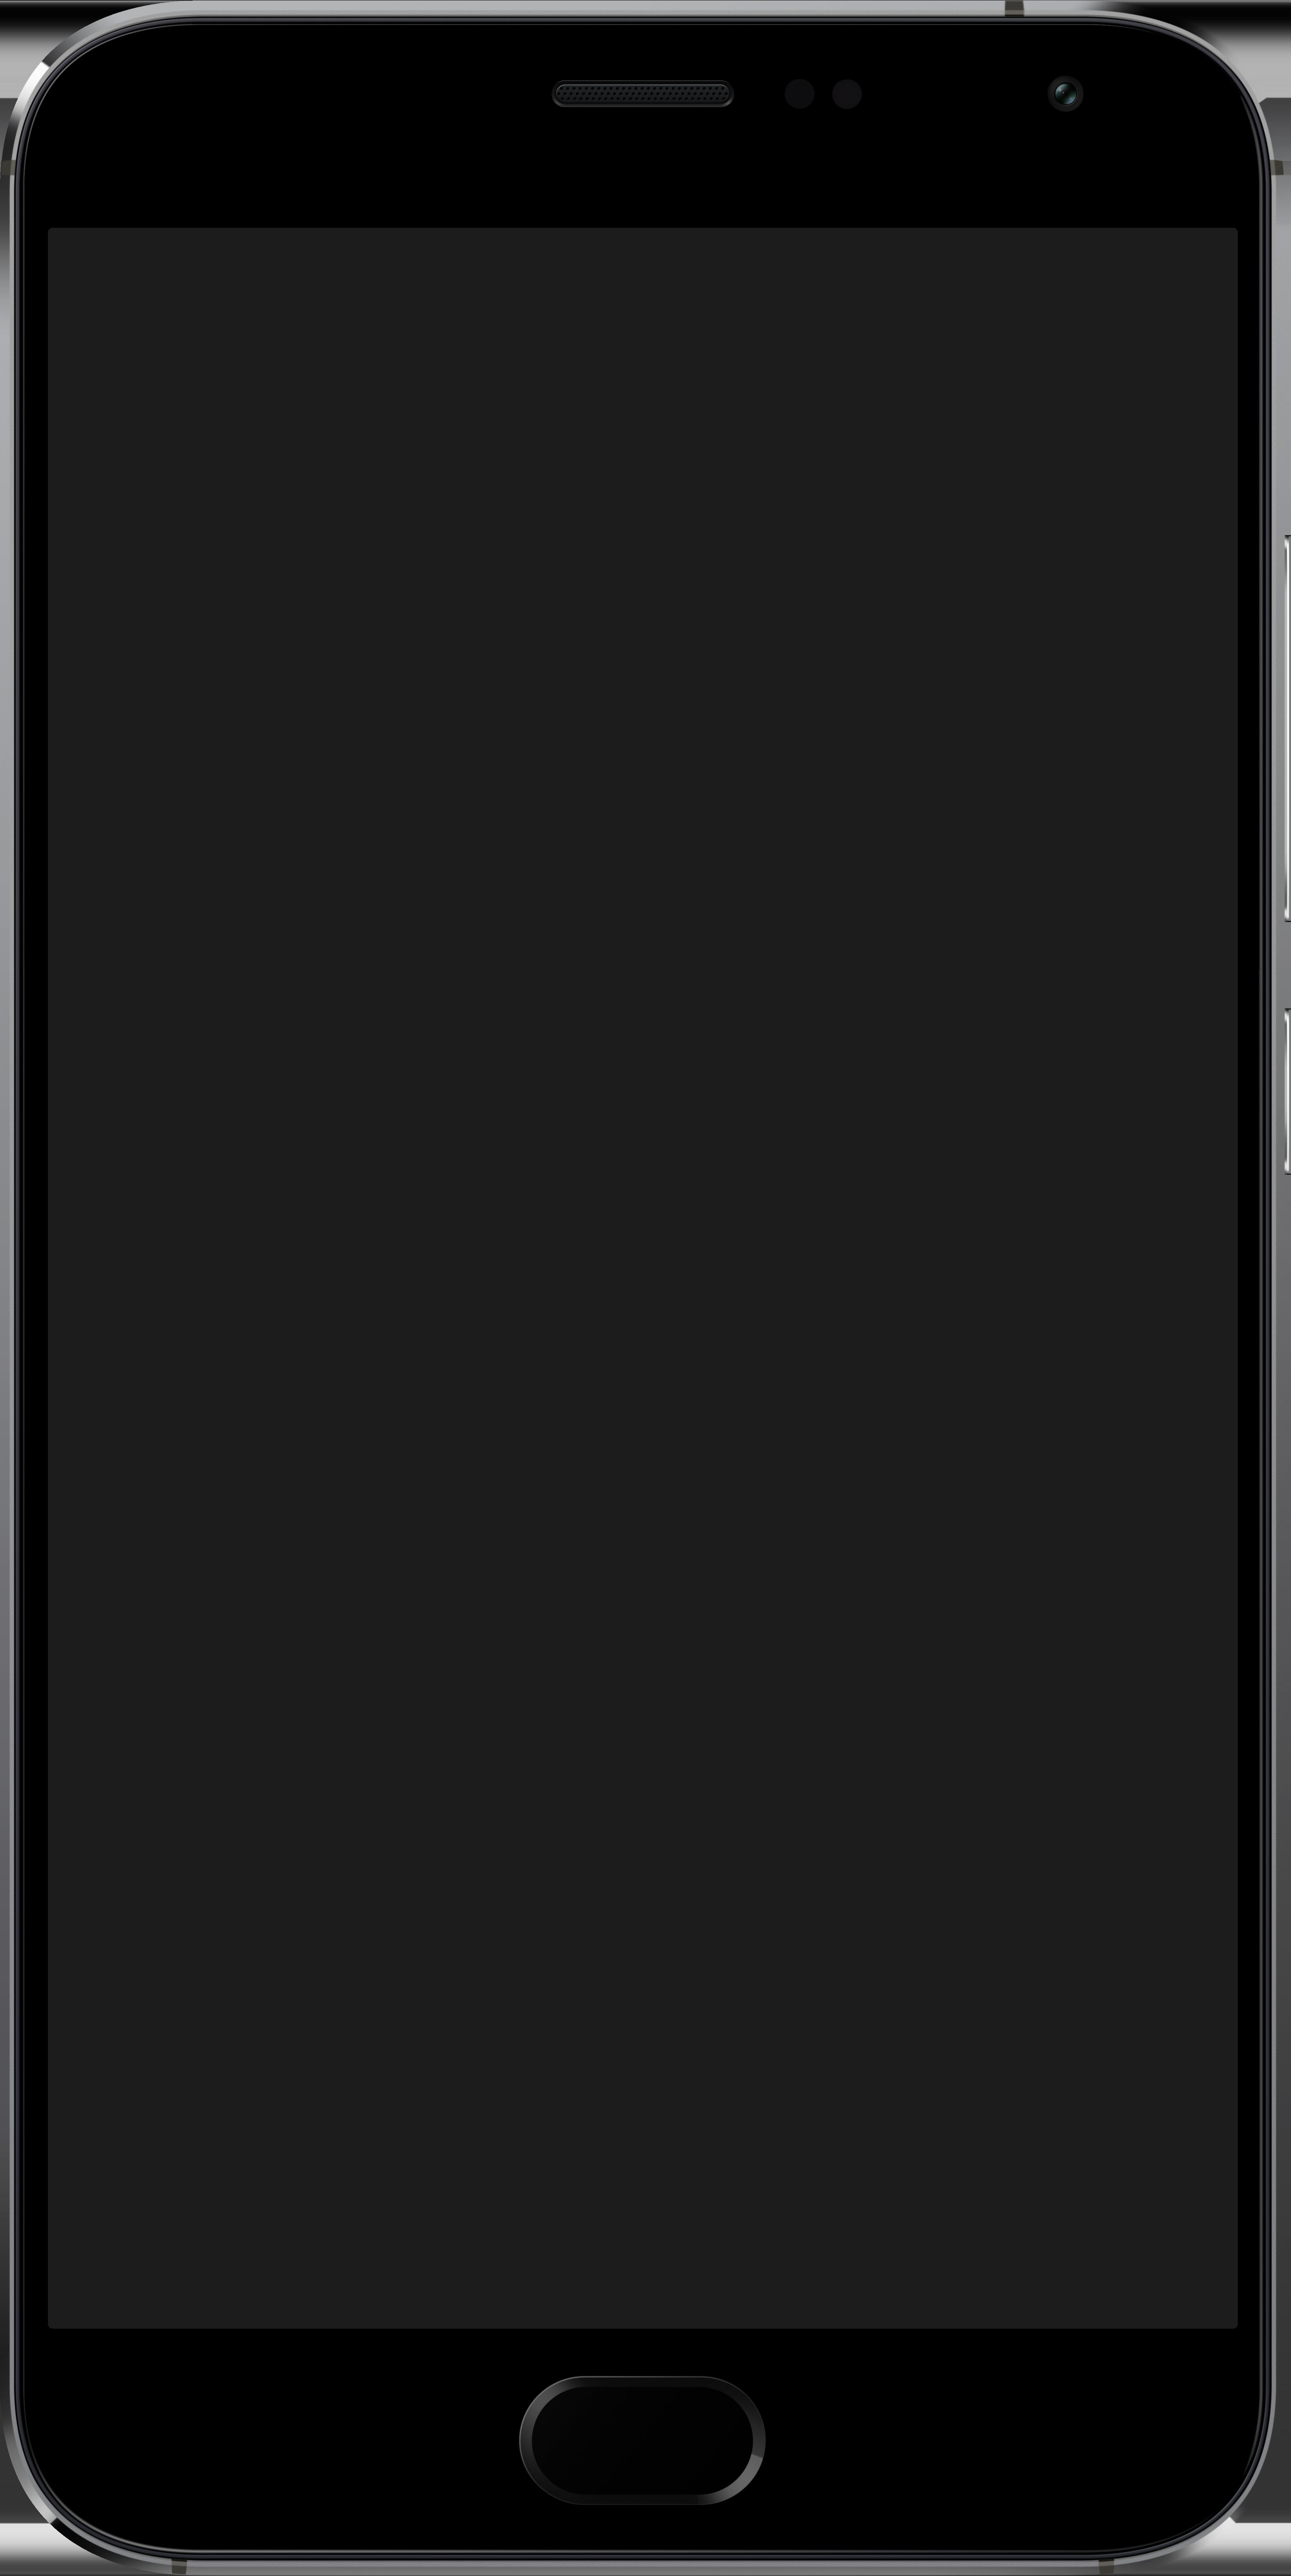 Meizu MX5 - Wikipedia